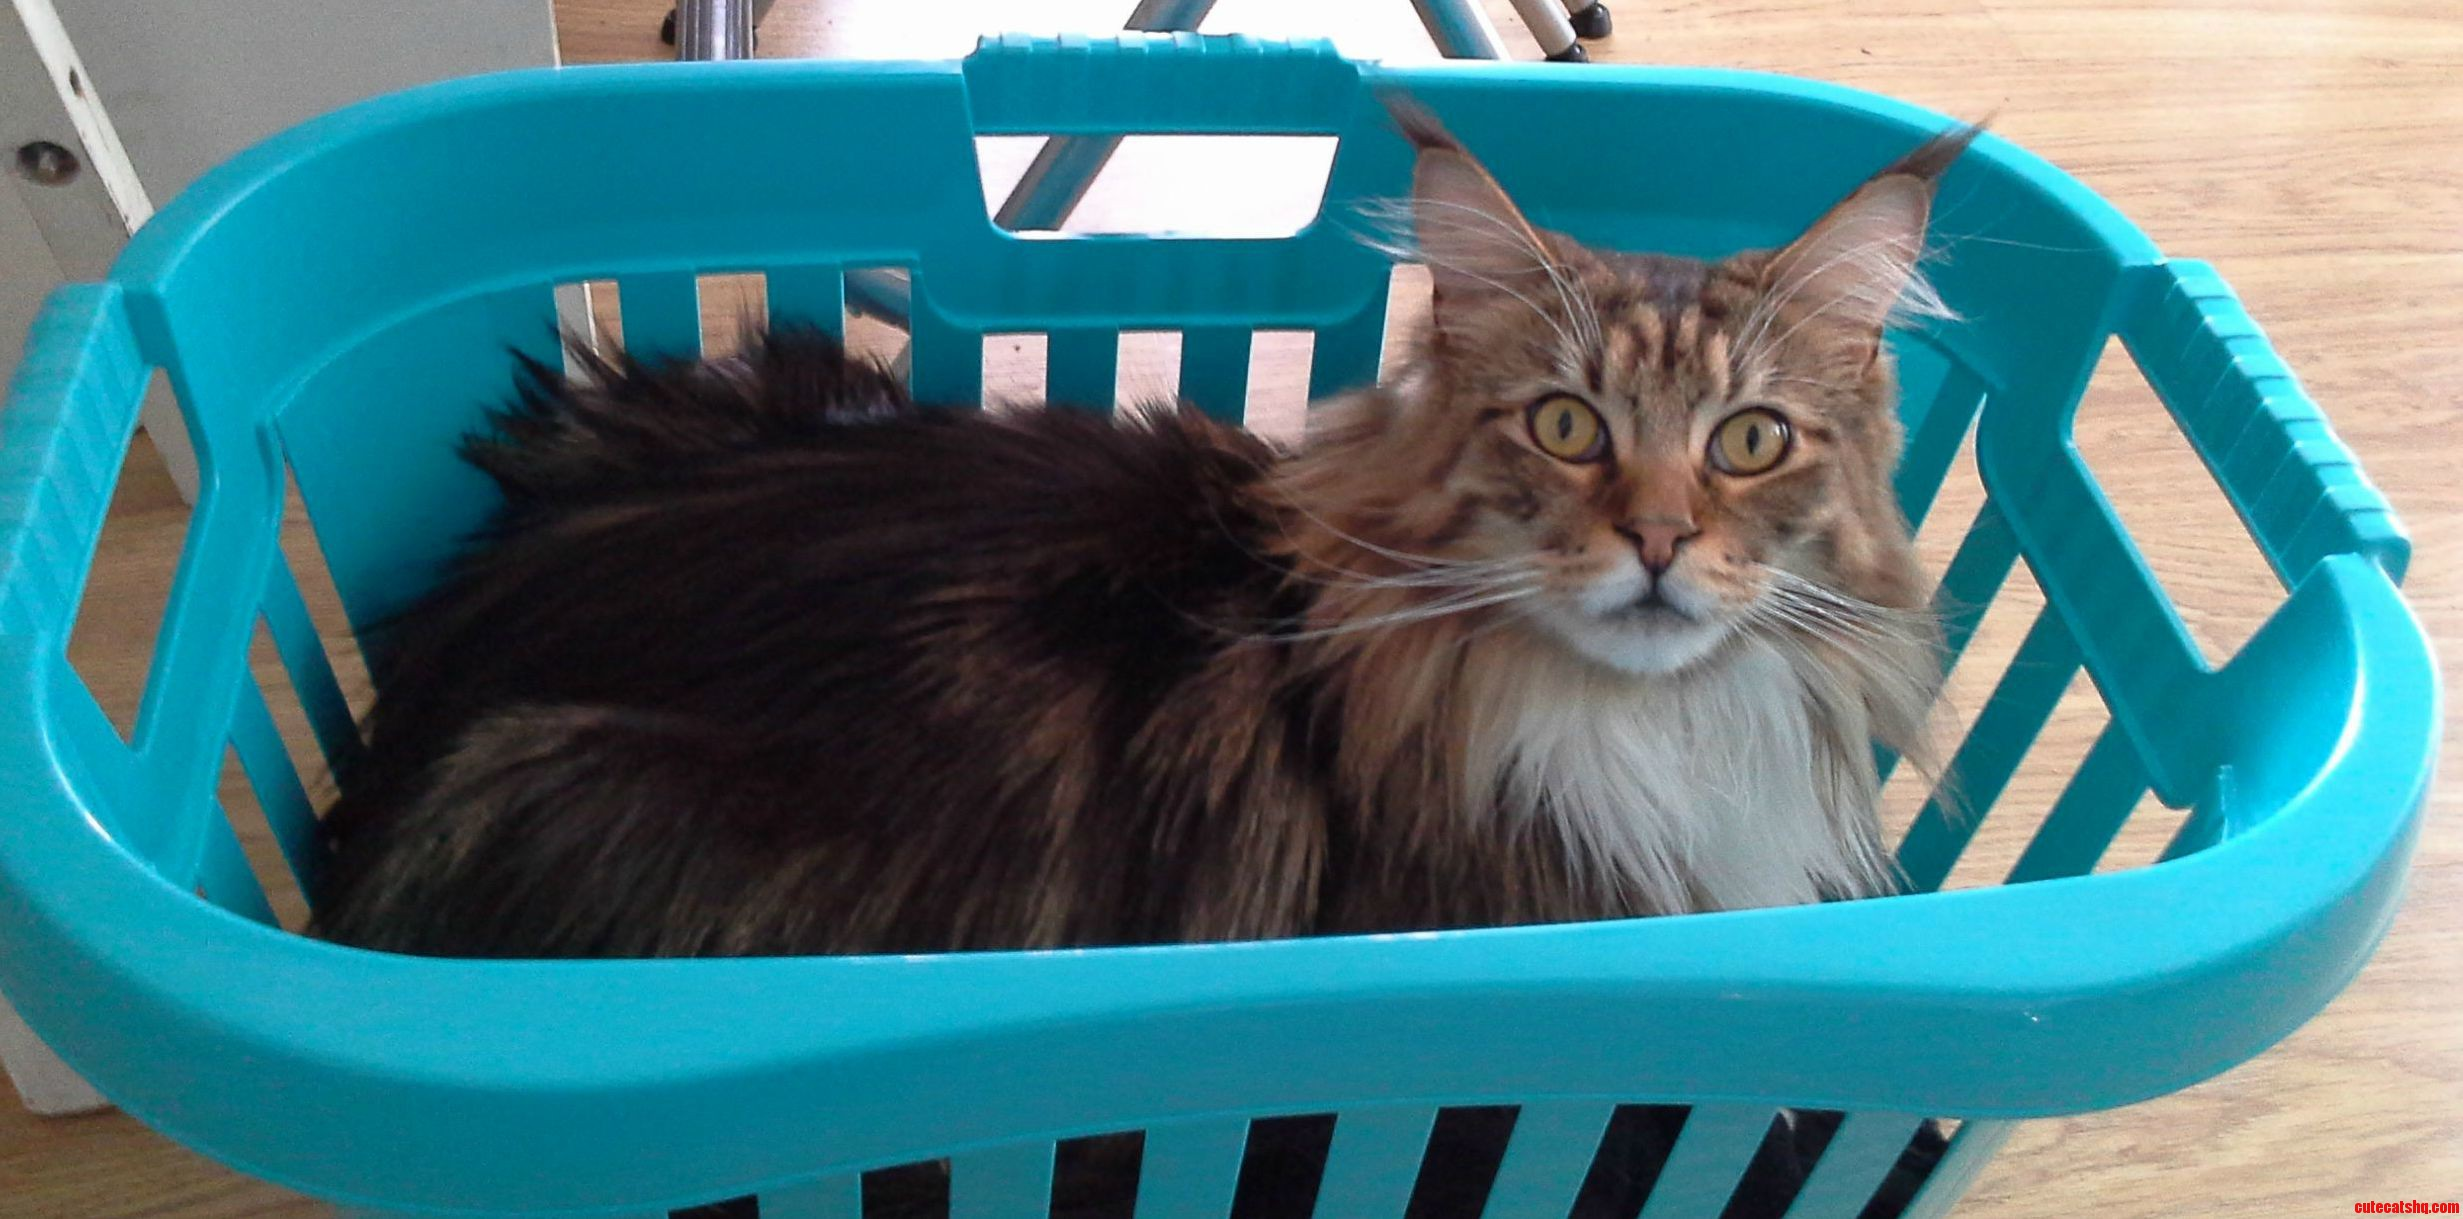 What human i like fresh laundry too